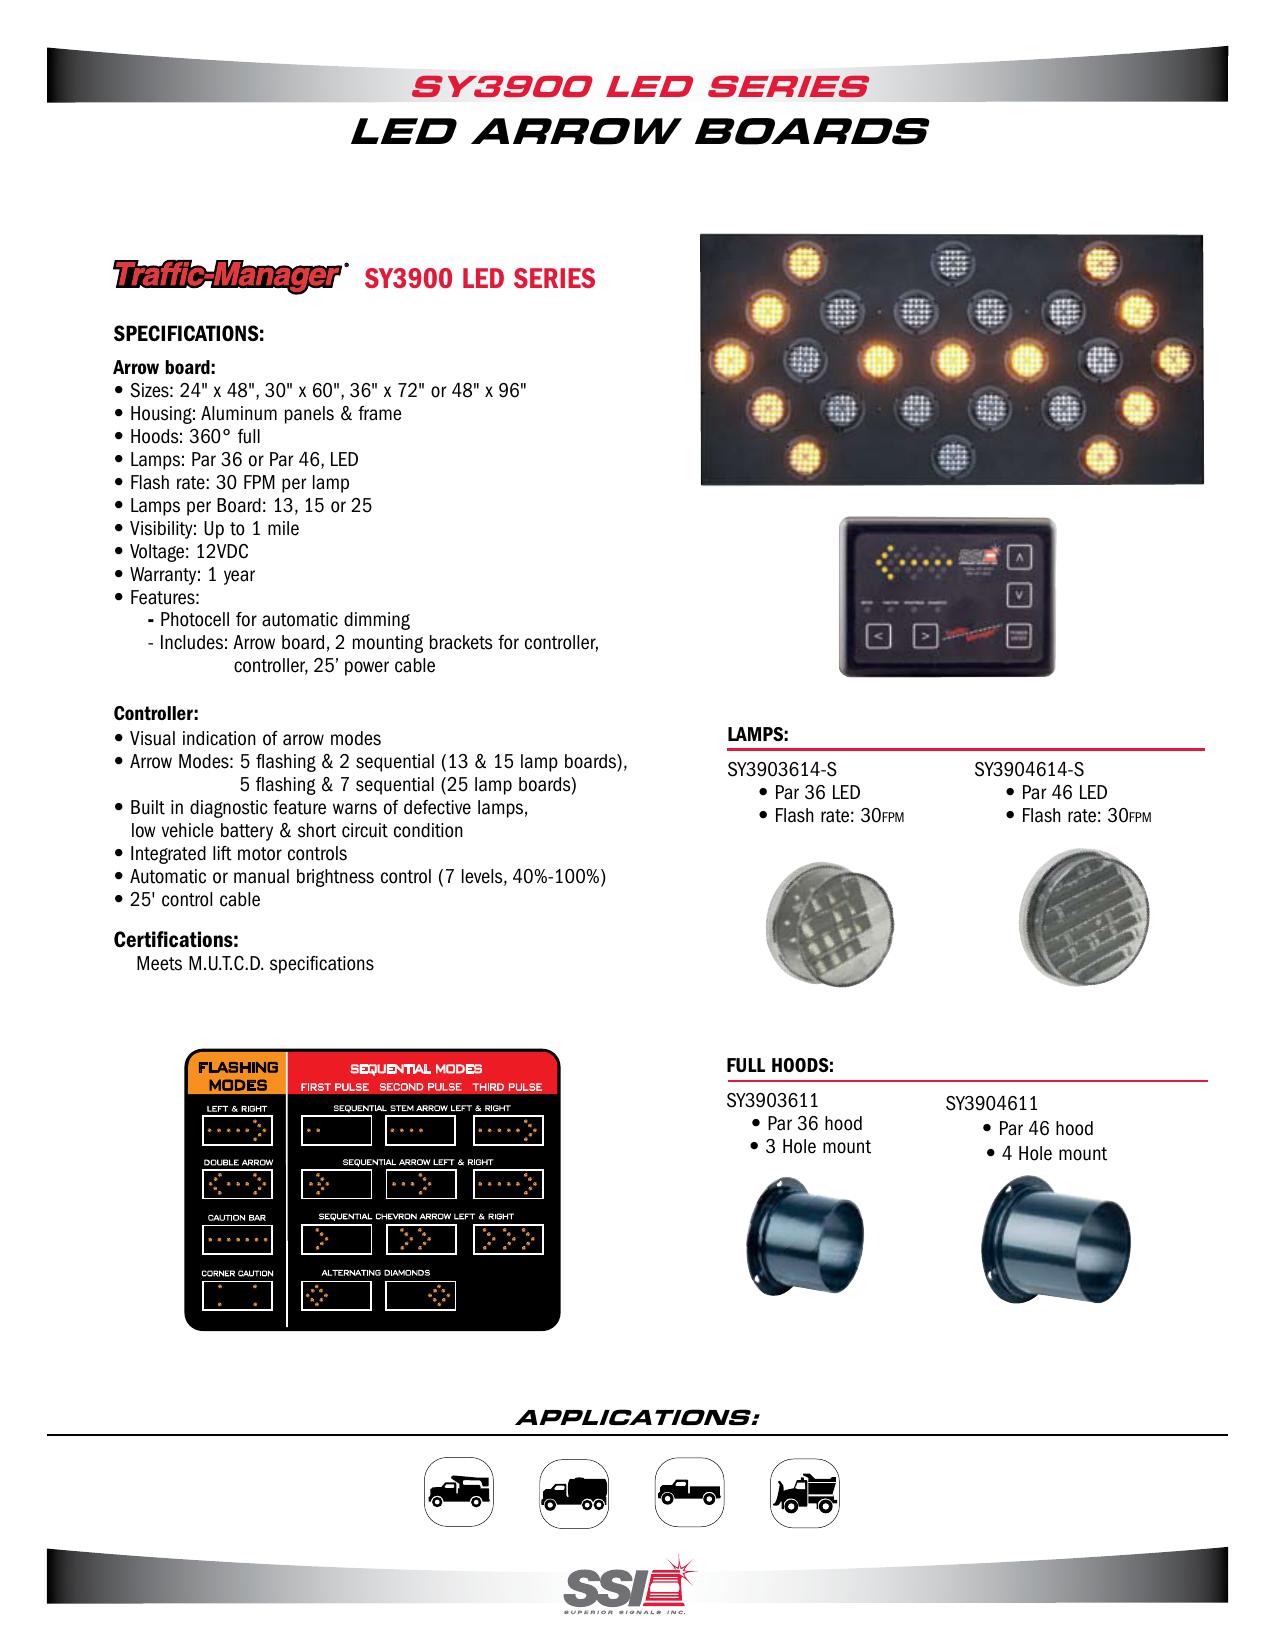 Integrated Circ Neets Flashing Morristowncab Simple Led Schematic Flashingledunitcircuit Dishwasher Blinks Or Beeps How To Fix